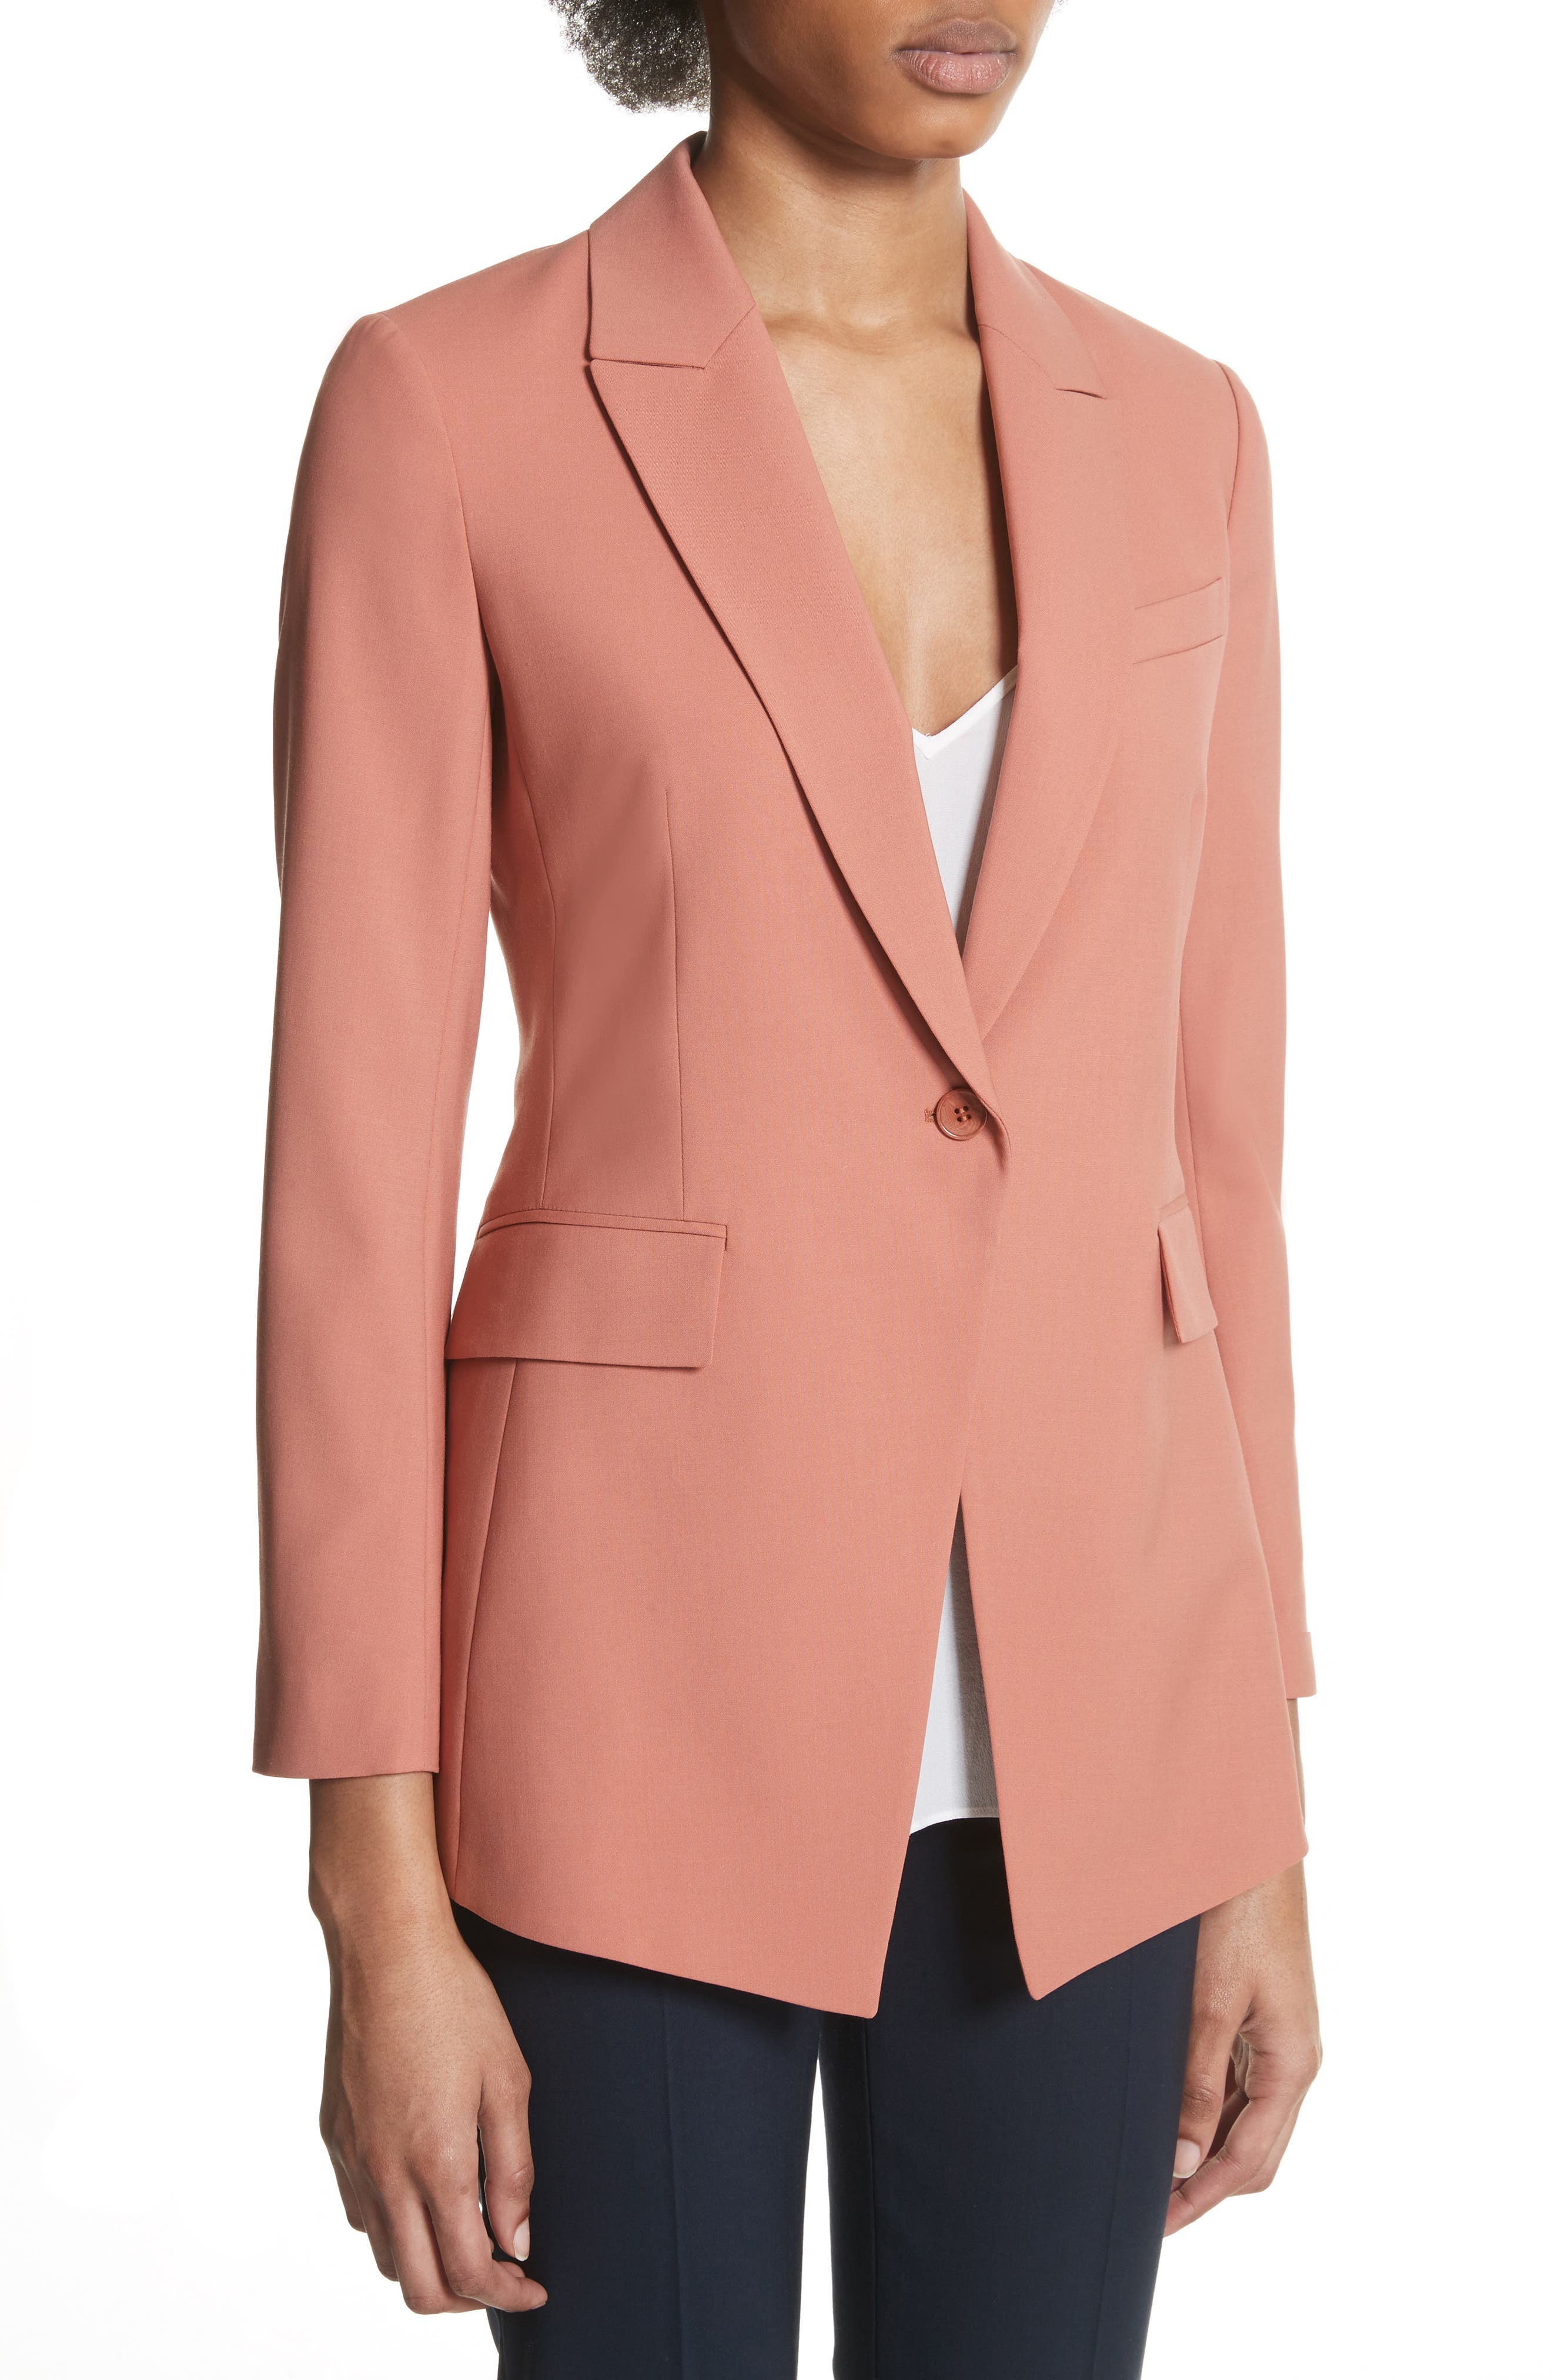 Etienette B Good Wool Suit Jacket,                             Alternate thumbnail 28, color,